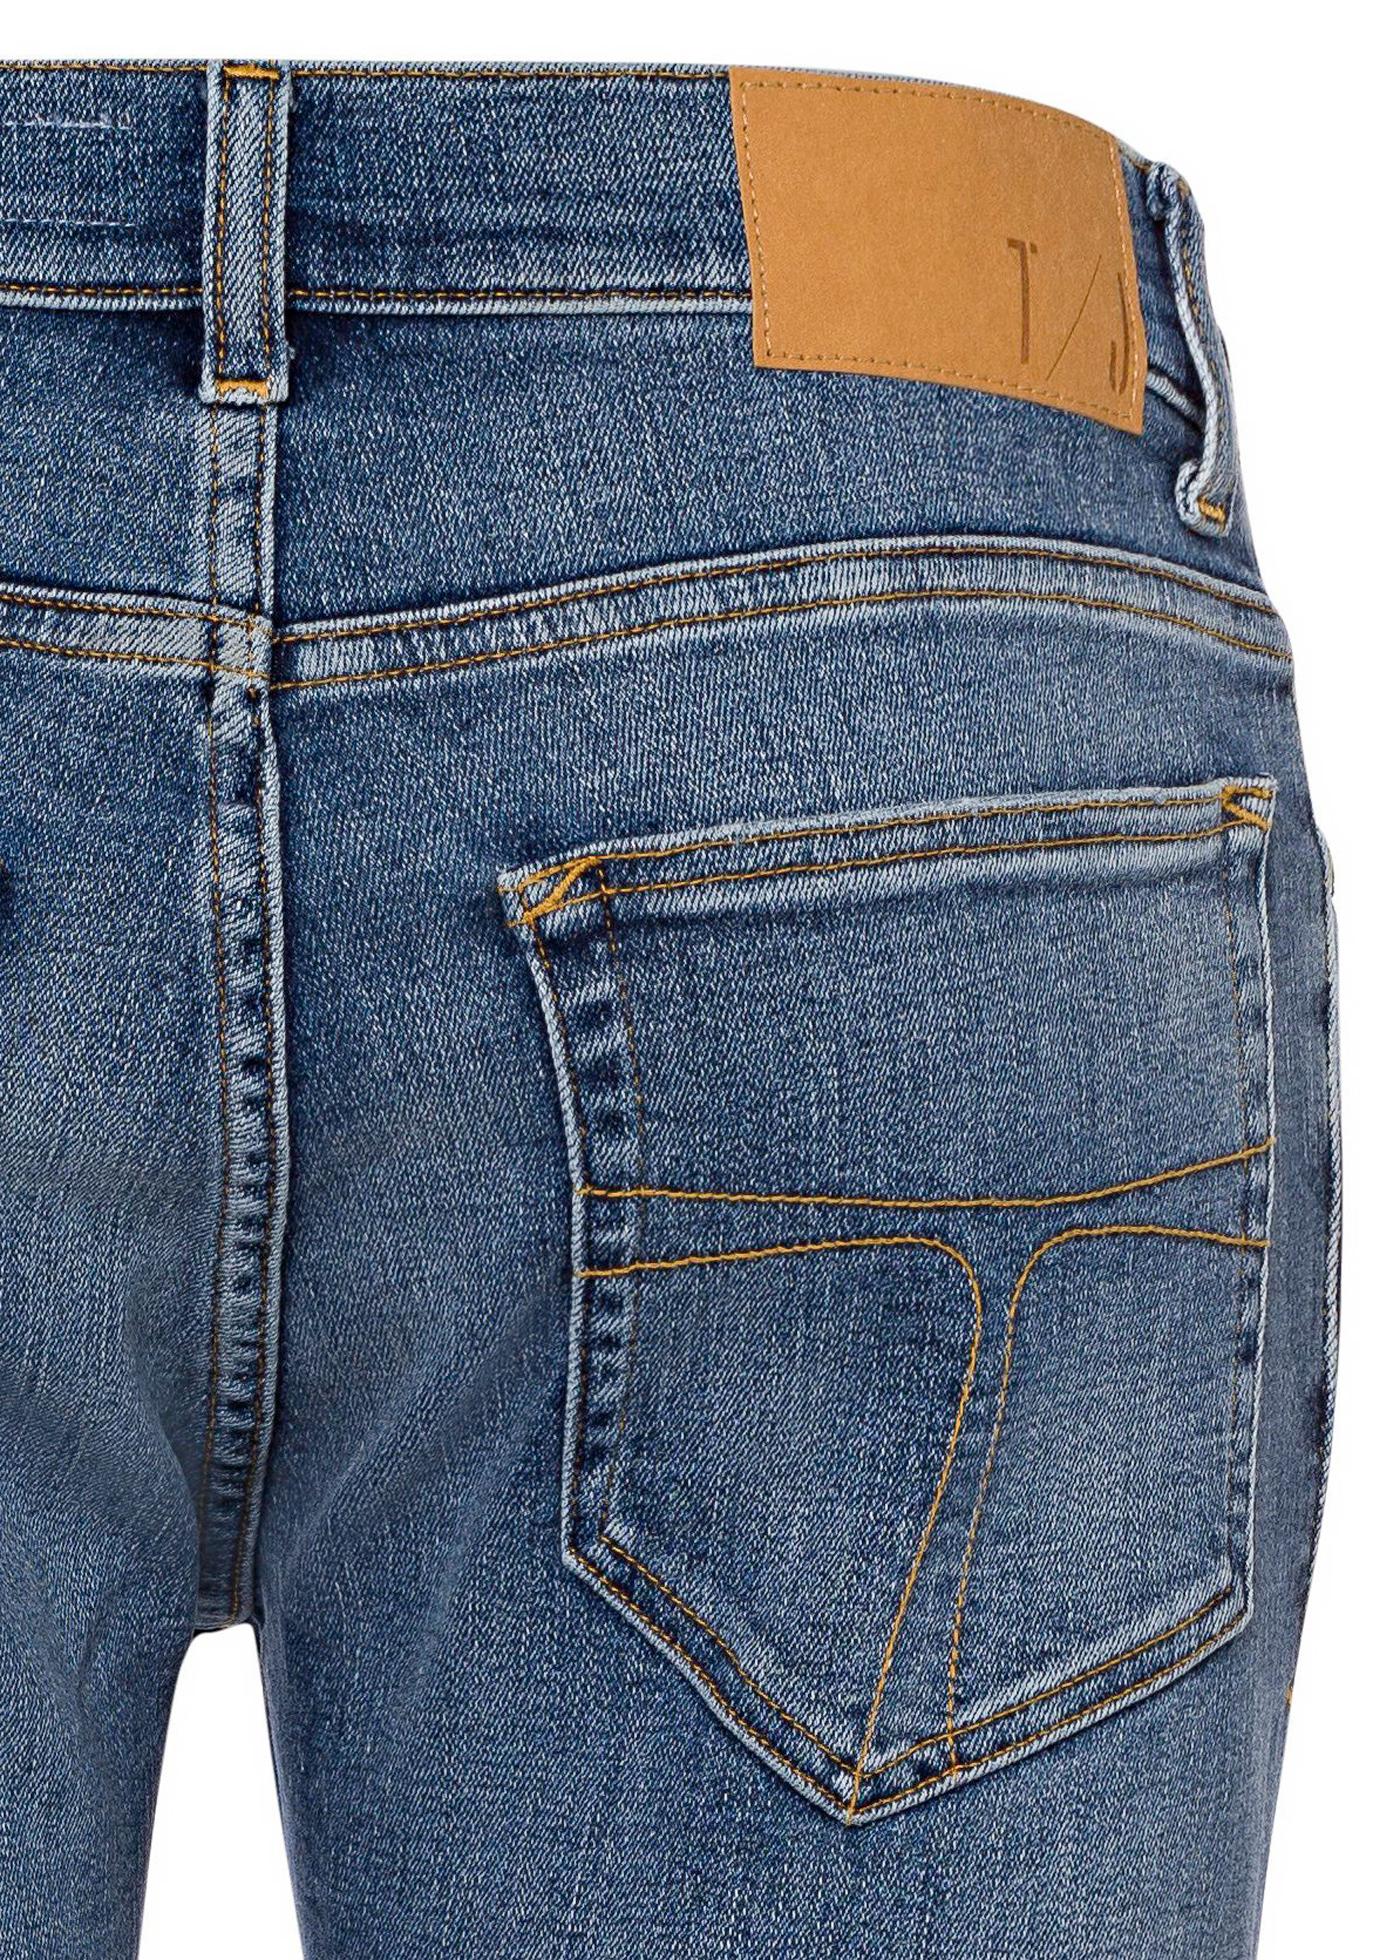 EVOLVE Jeans male 21F 36 image number 3